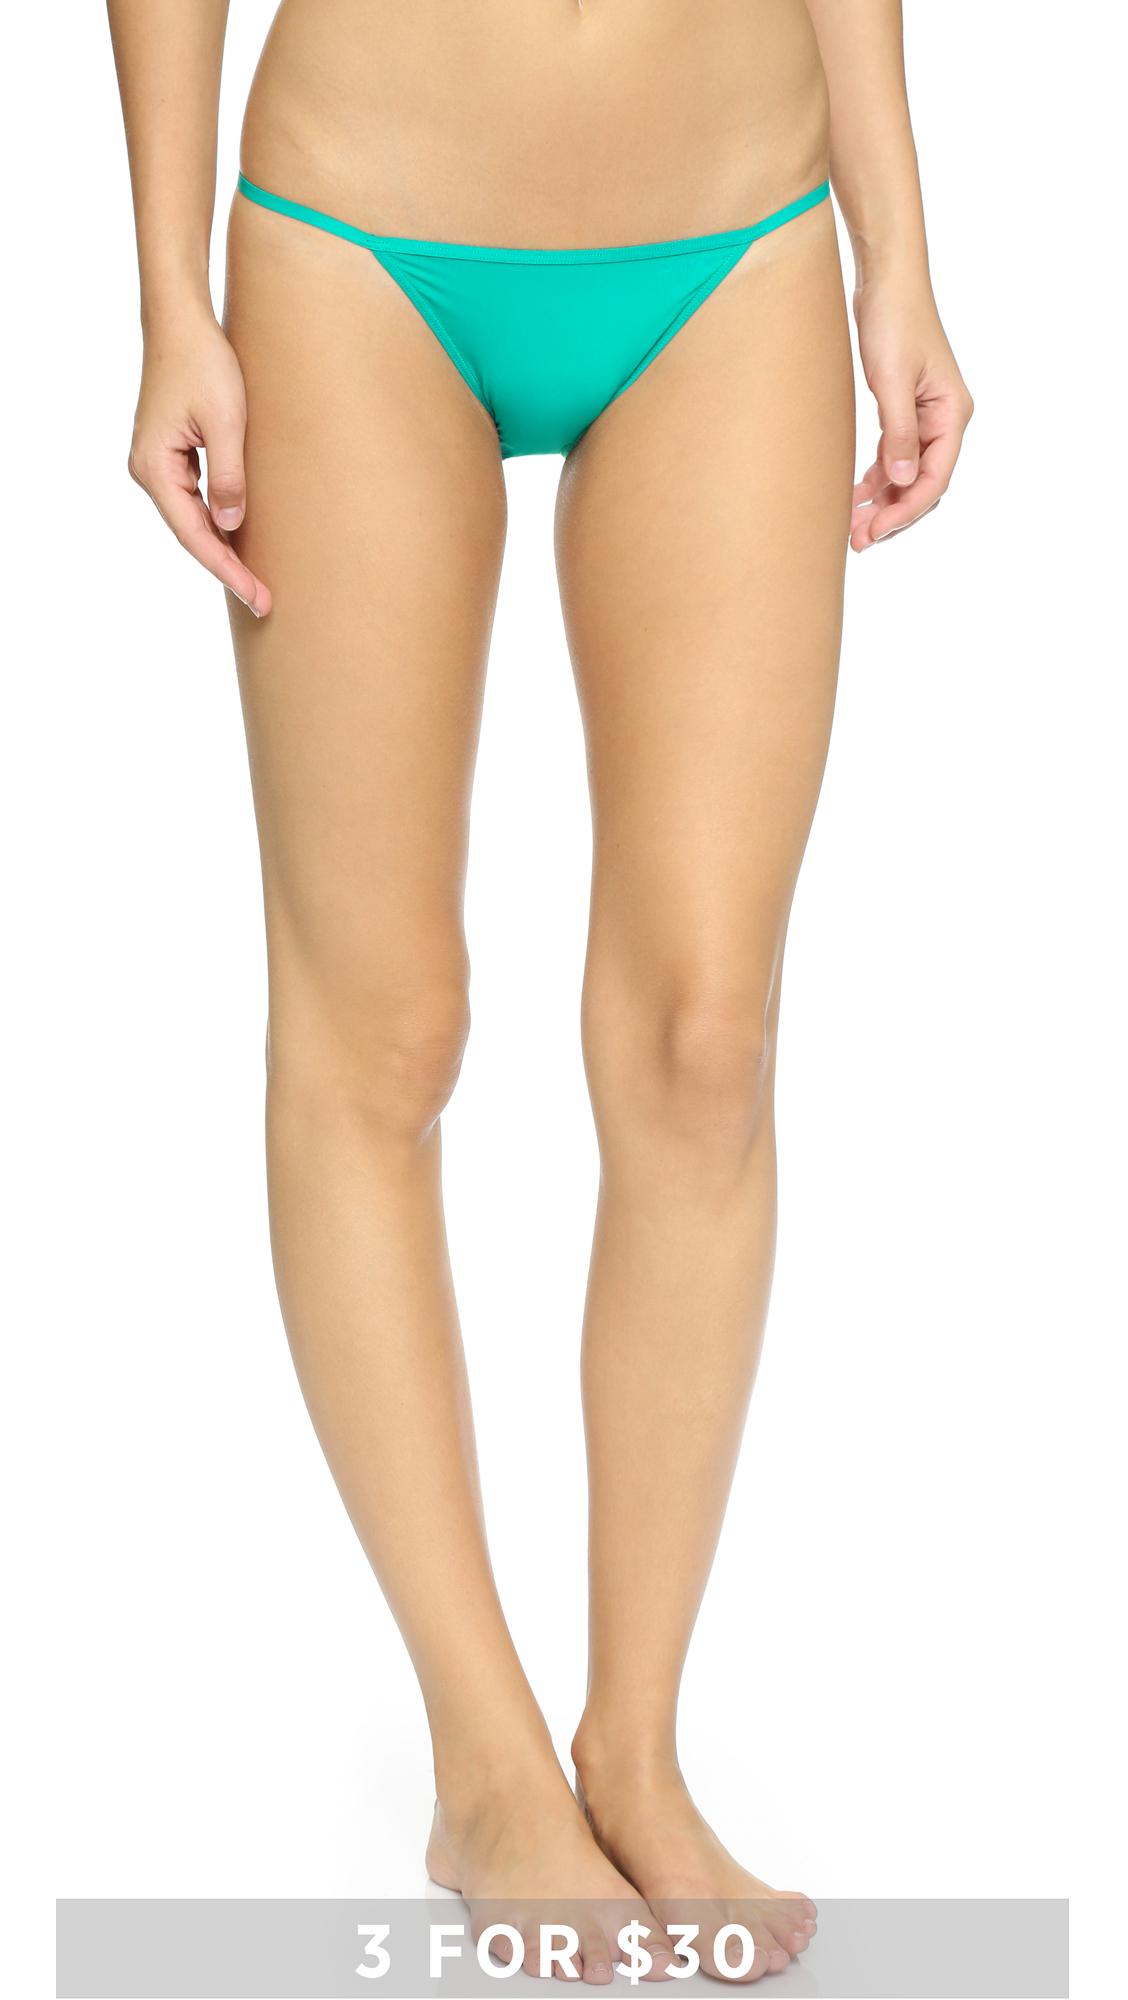 f24799d8858 Calvin Klein Sleek String Bikini Panties - Purity in Green - Lyst